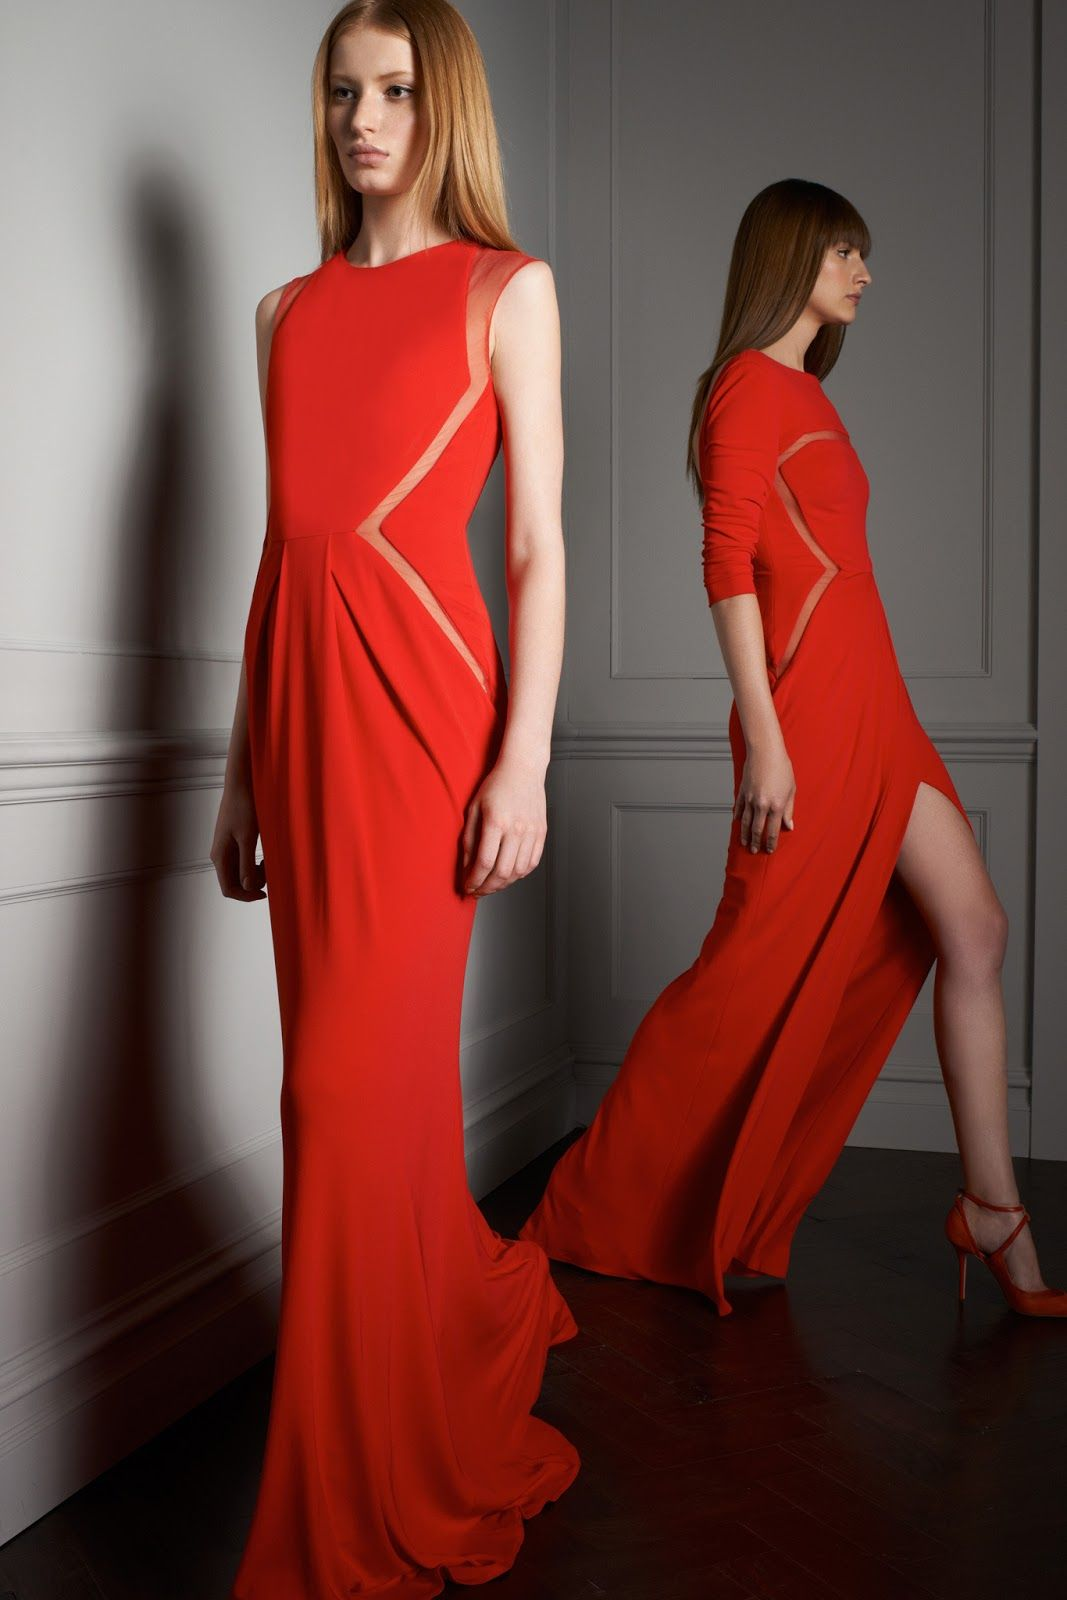 stephanie hall and maria kashleva by elie saab resort 2014 | visual optimism; fashion editorials, shows, campaigns & more!